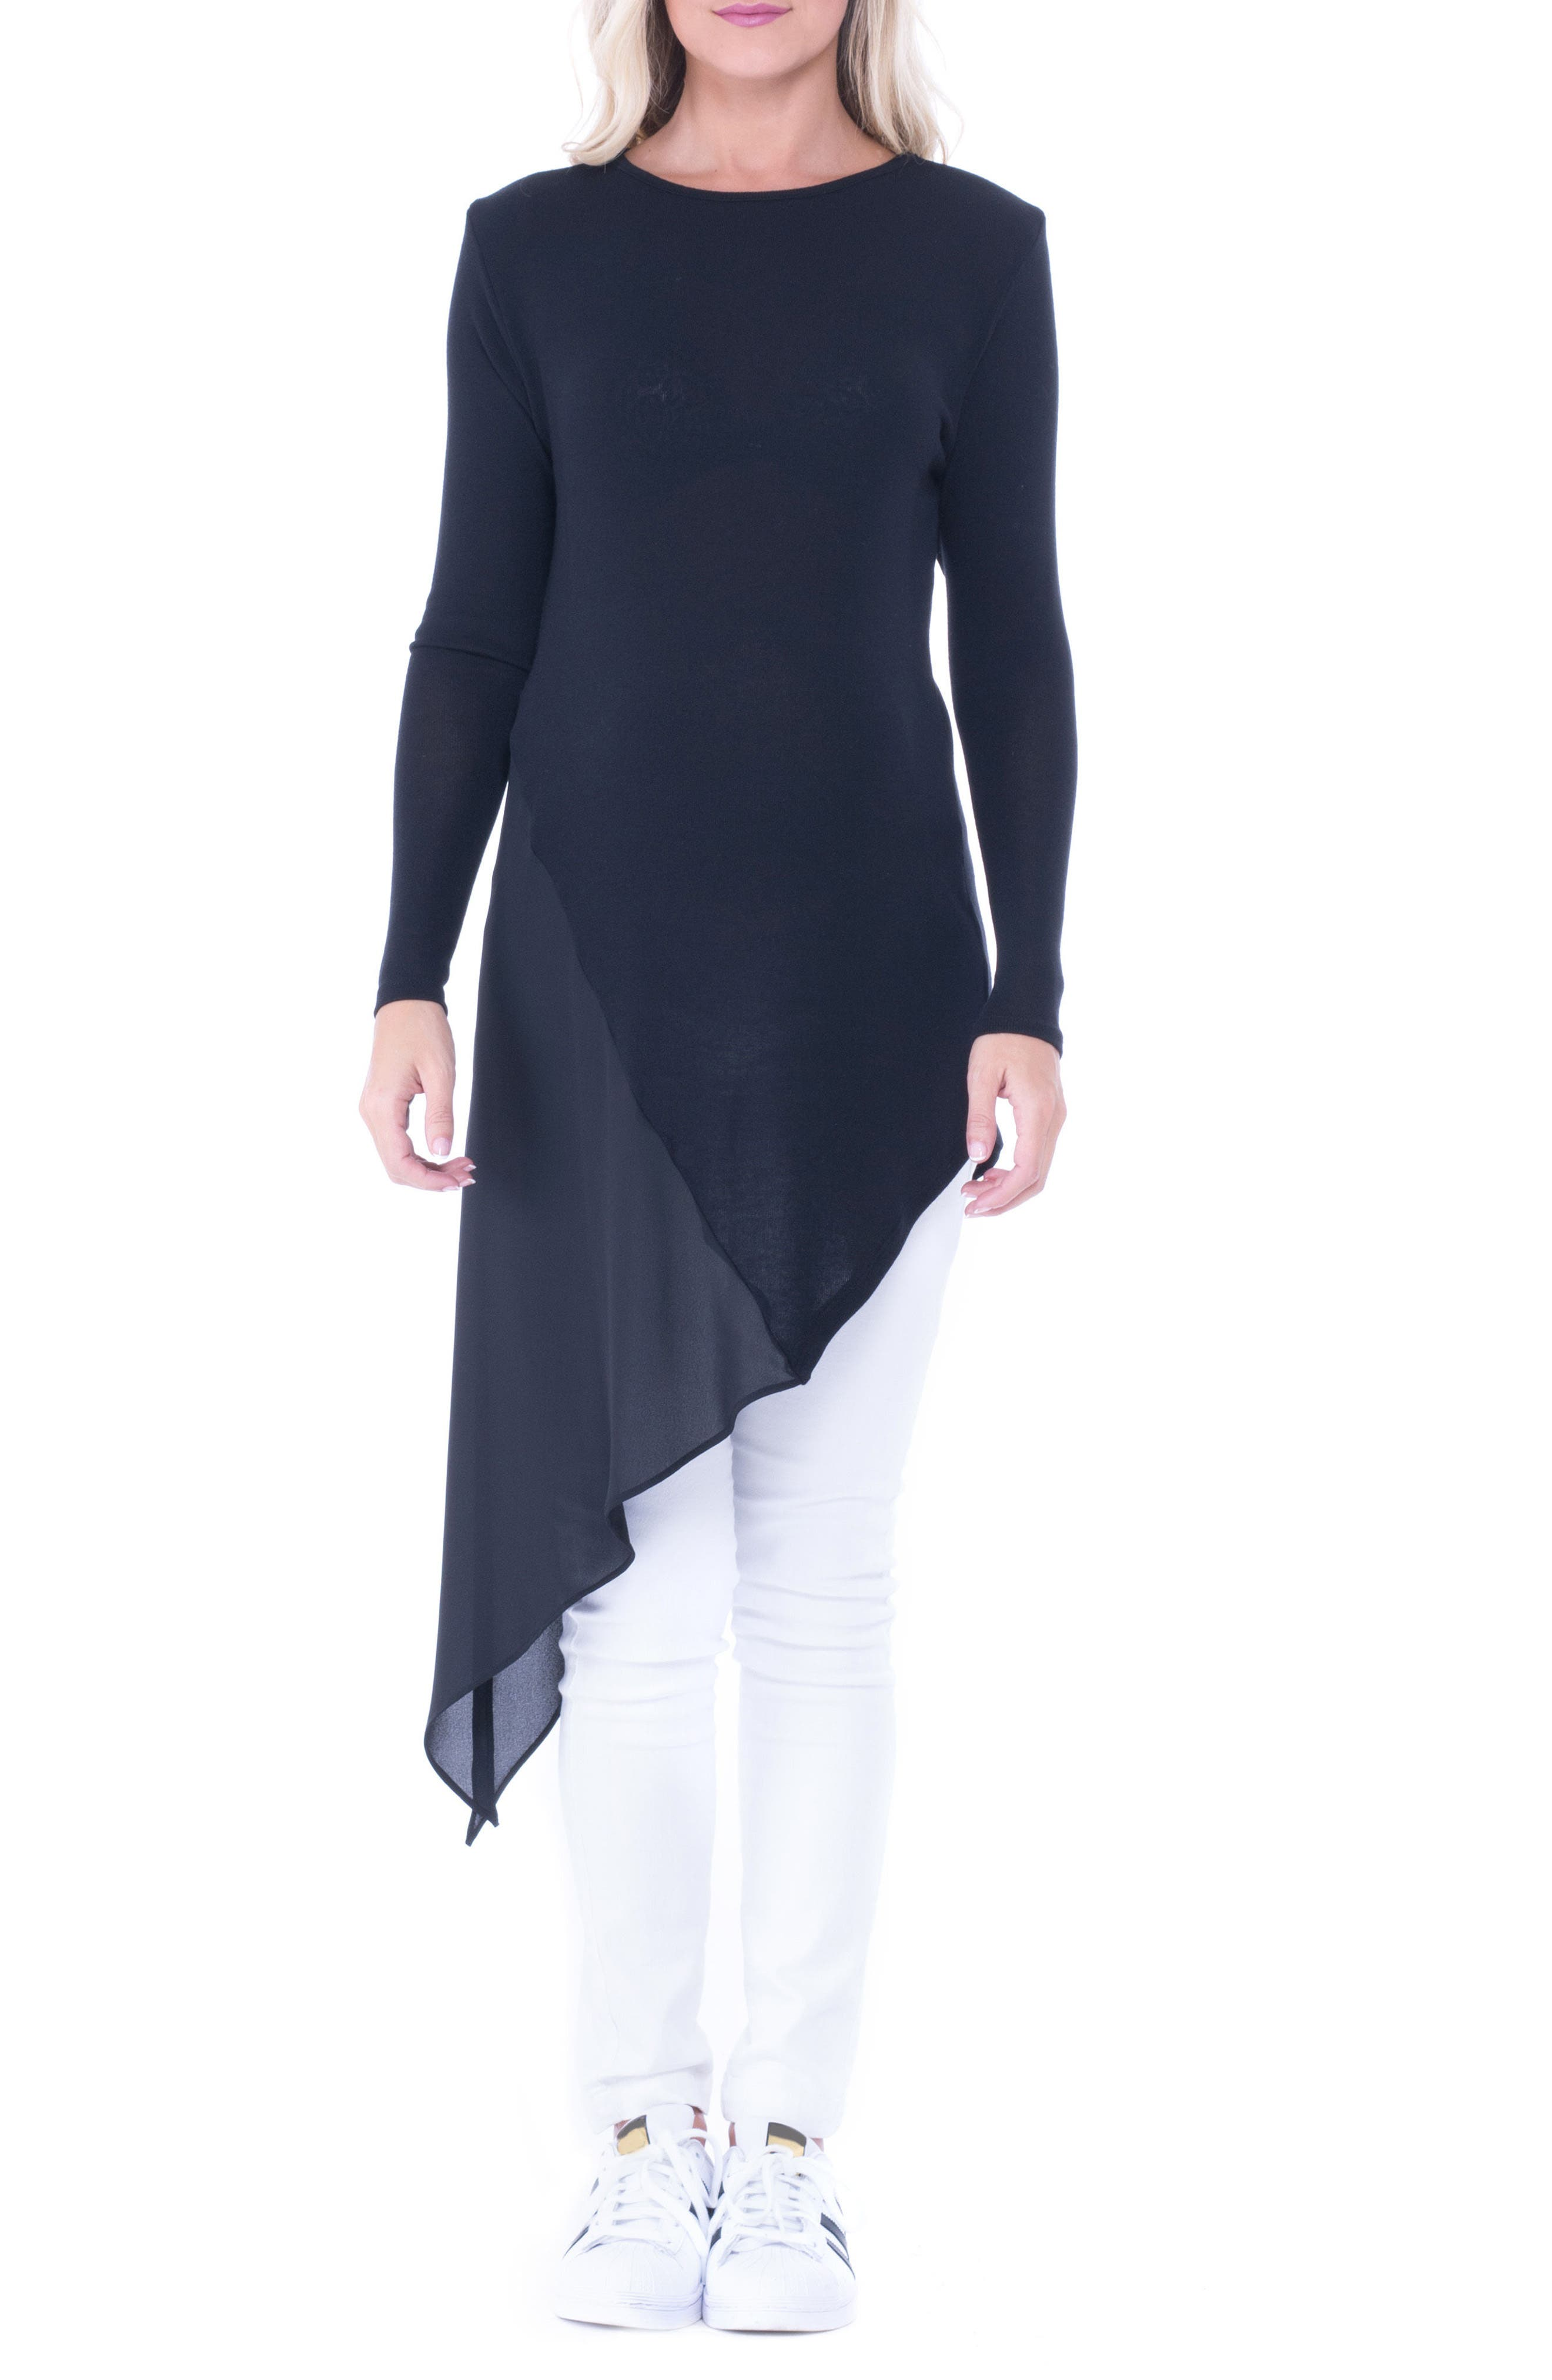 Main Image - Olian Leah Side Tie Maternity Top